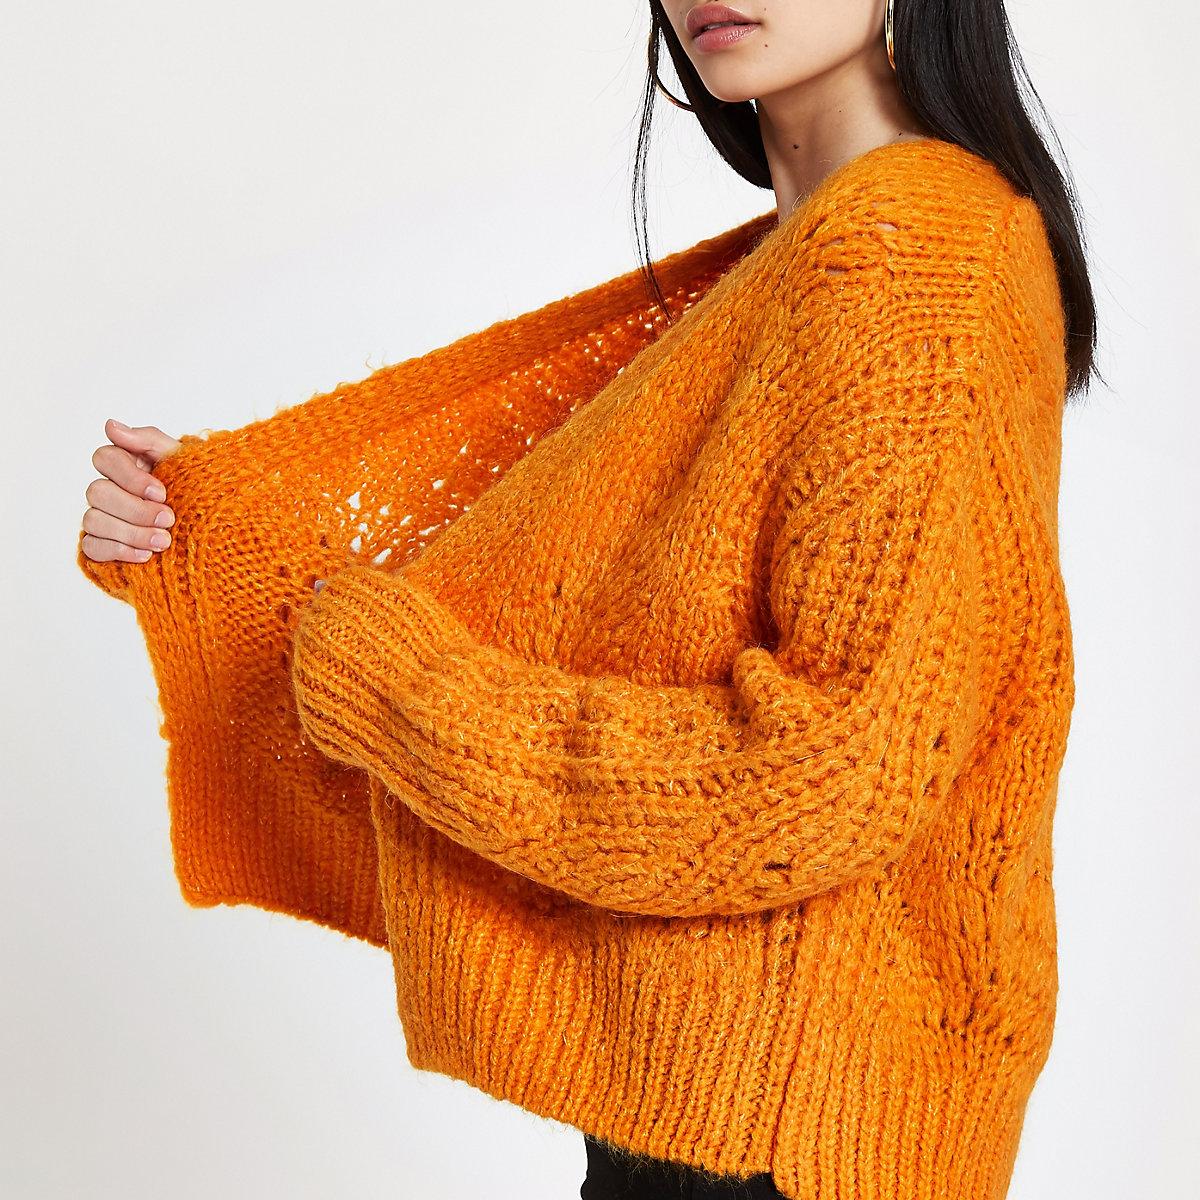 Orange knitted cardigan